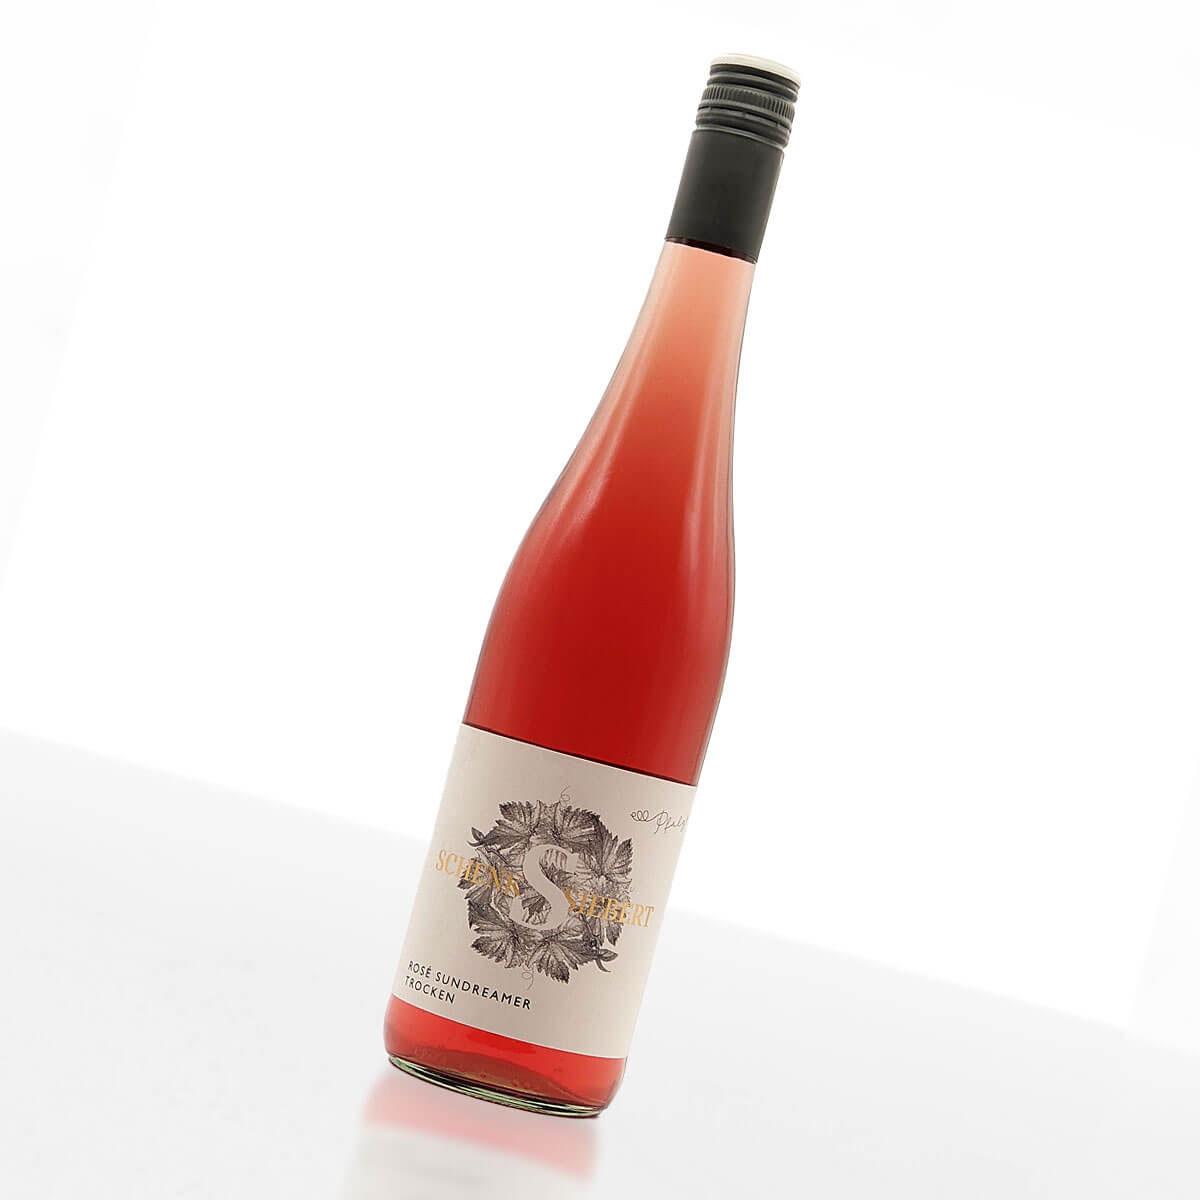 2019 Sundreamer Rosé trocken • Weingut Schenk-Siebert